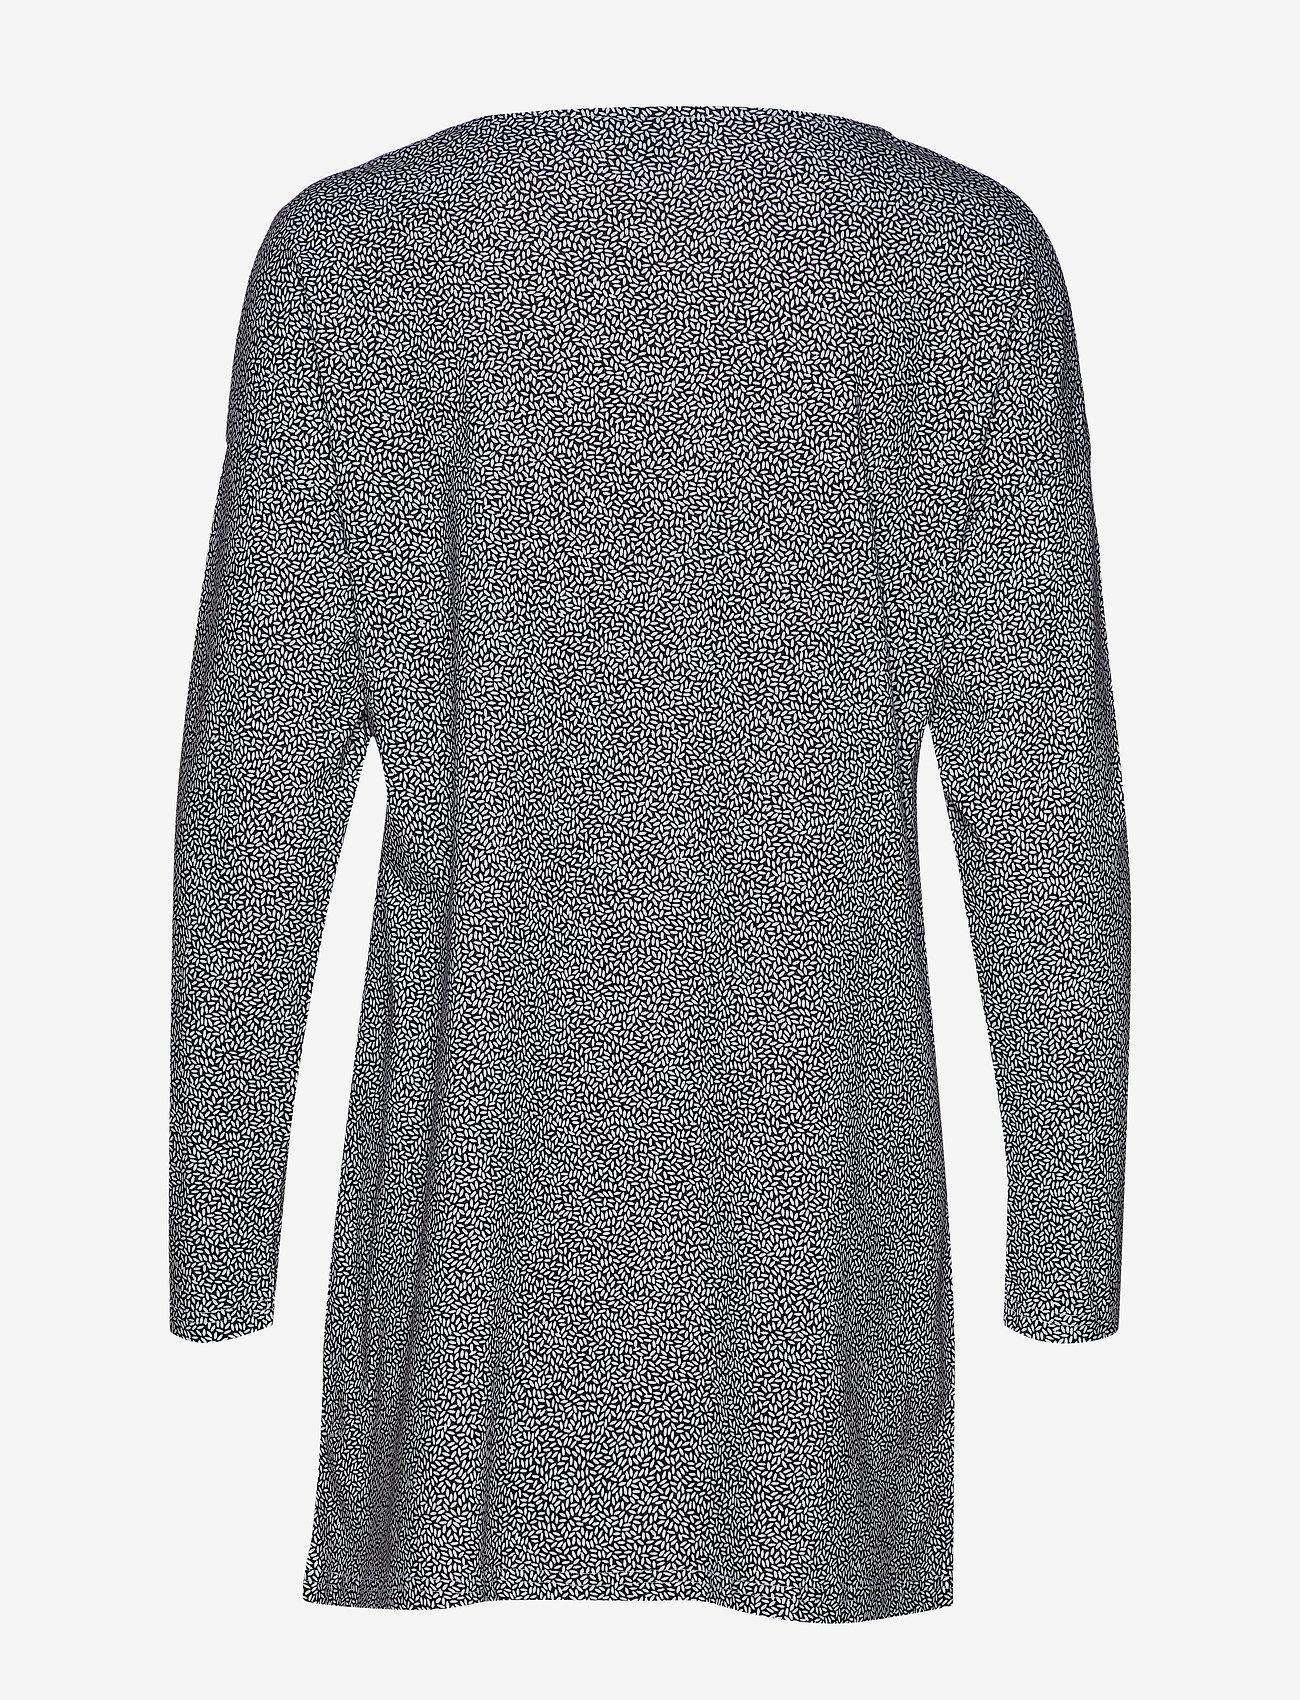 Nanso - Ladies tunic, Riisi - robes courtes - black - 1